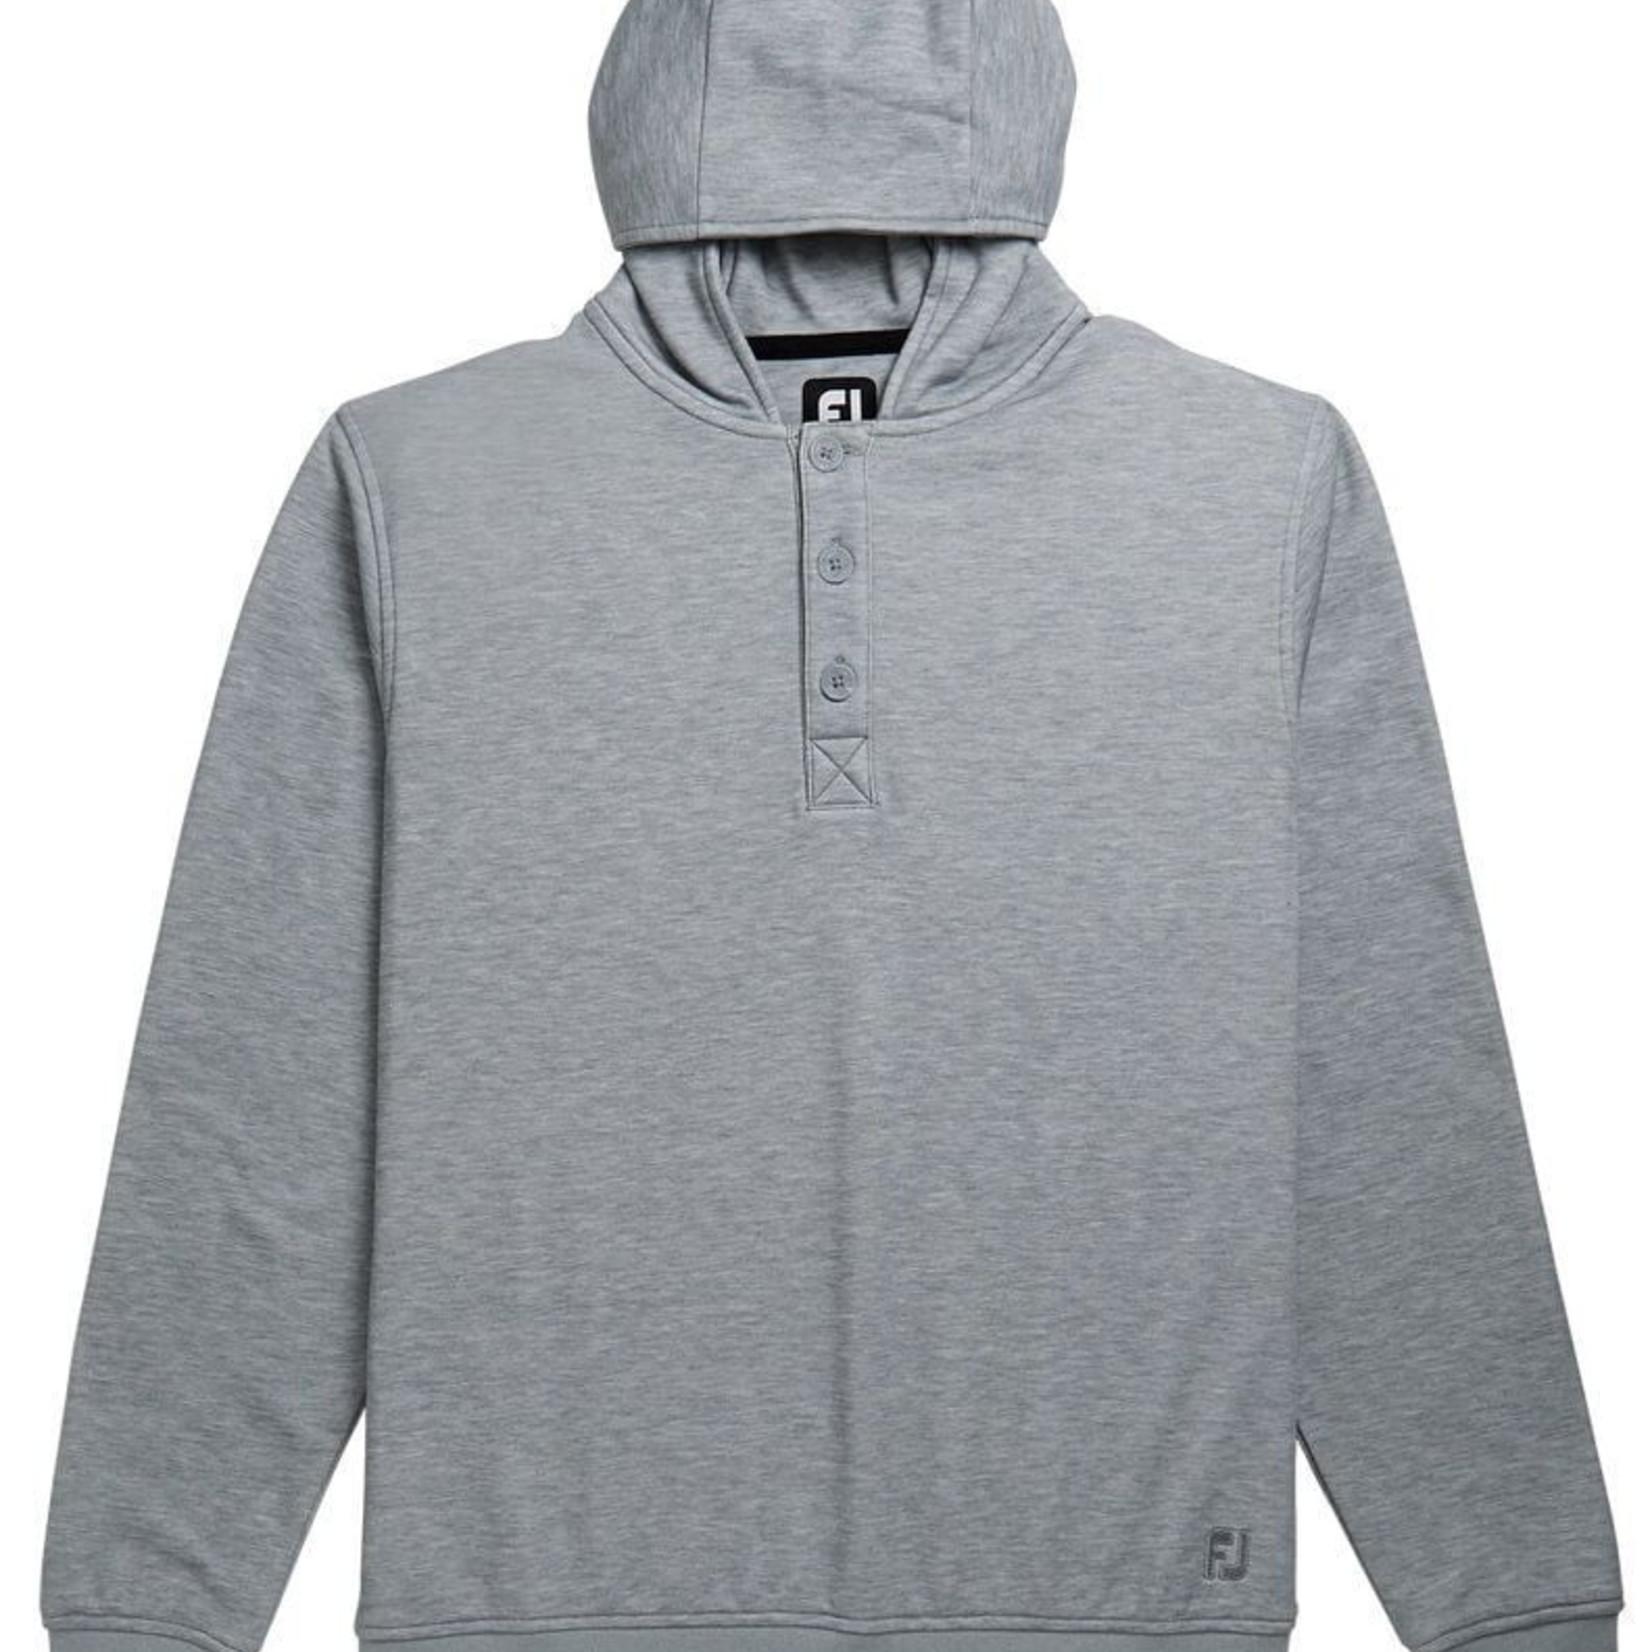 Footjoy FJ 25120 Jersey Fleece Hoodie Grey Medium